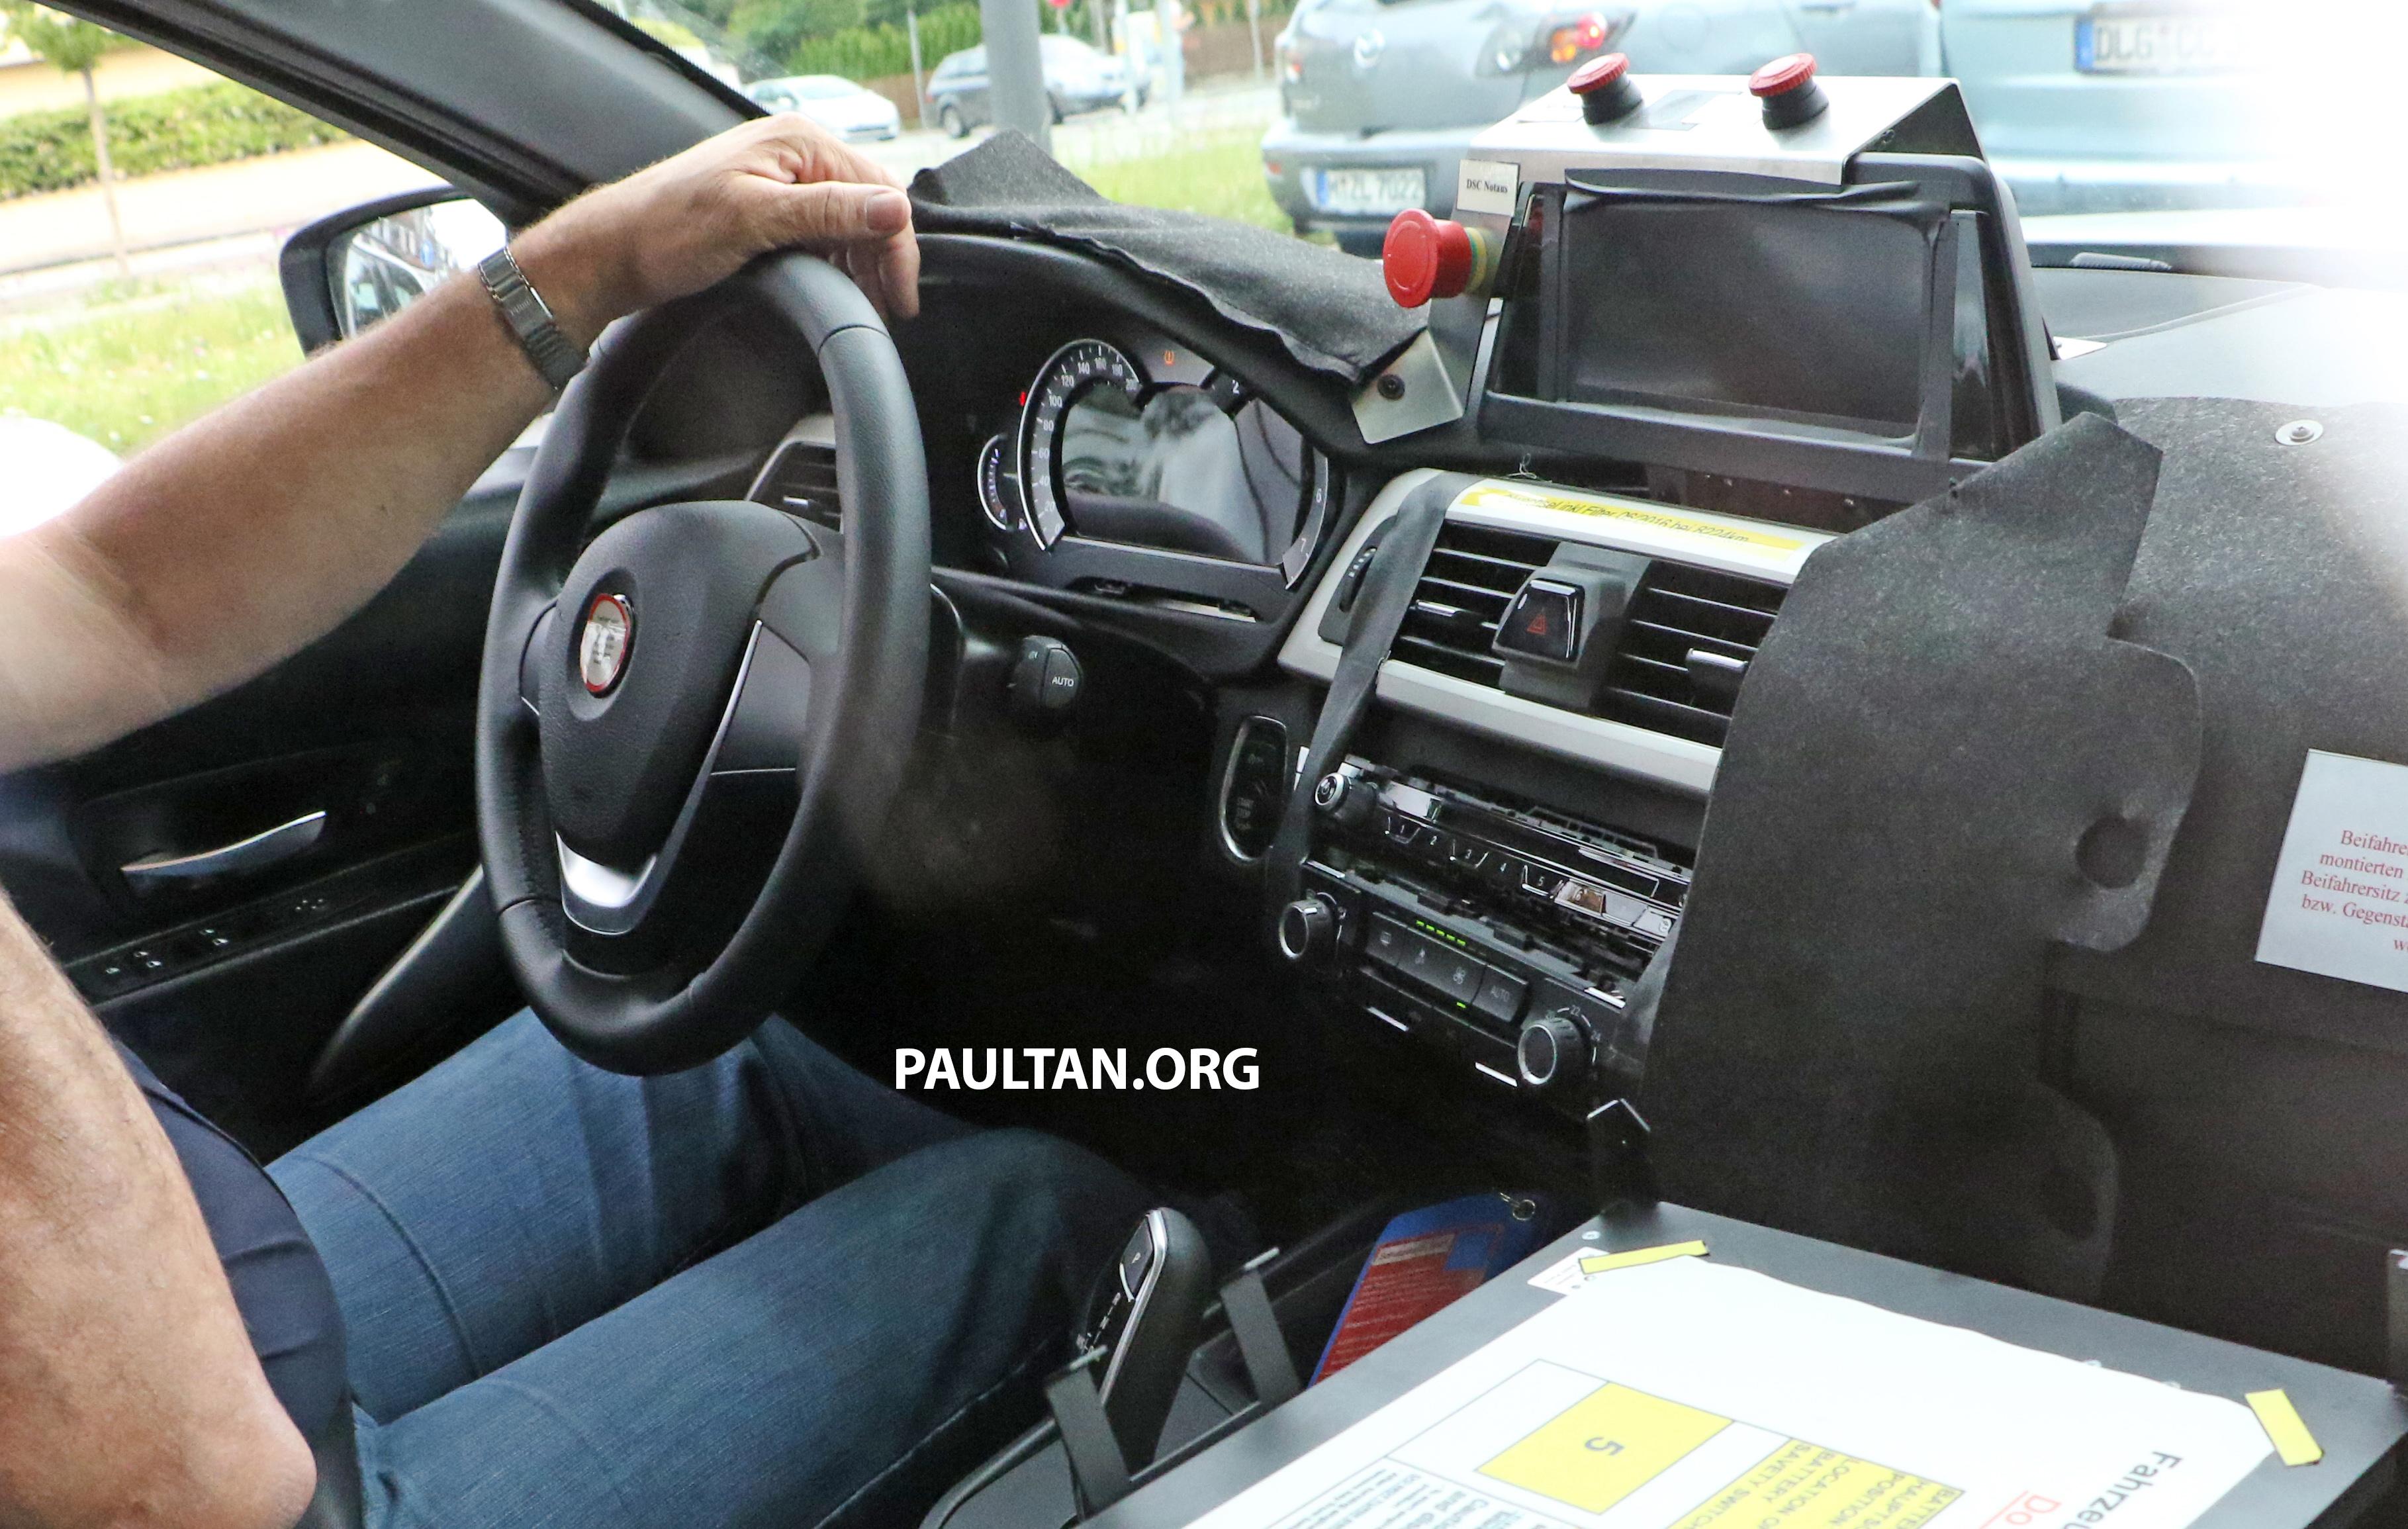 2018 Bmw 3 Series >> SPYSHOTS: G20 BMW 3 Series caught, interior seen Paul Tan - Image 531908